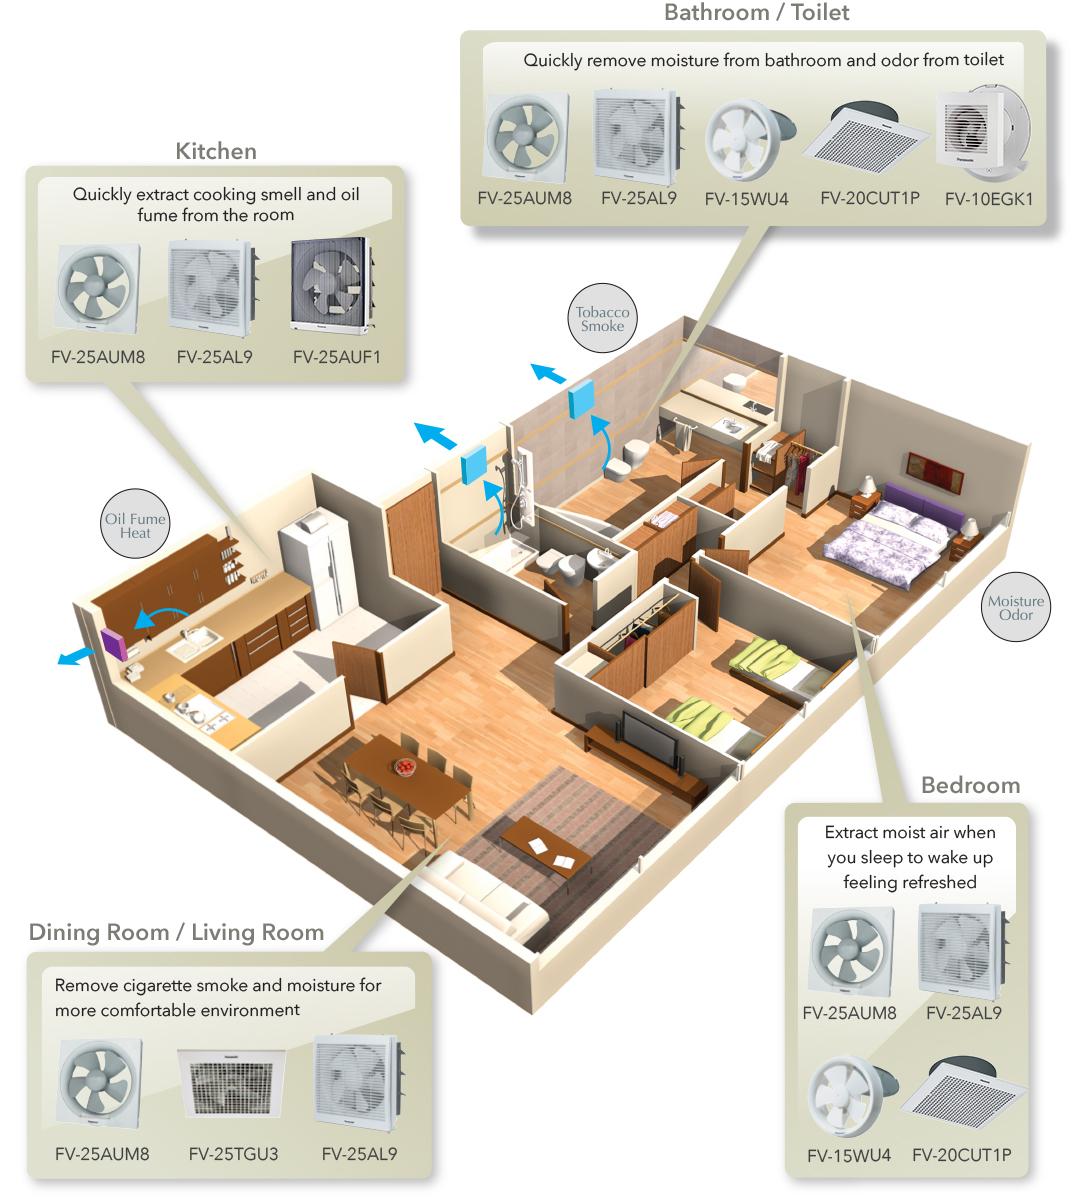 Ideal places to fix your ventilation fan.